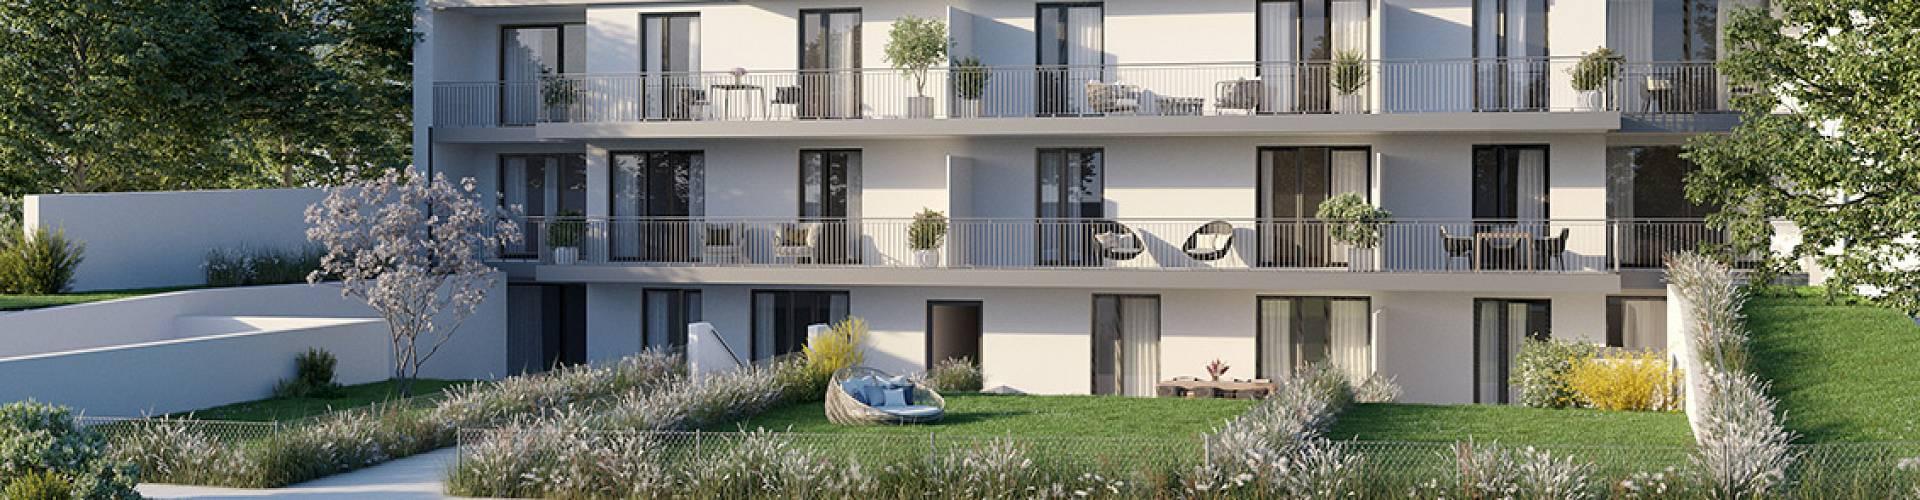 Urbanstyleliving in Maria Enzersdorf